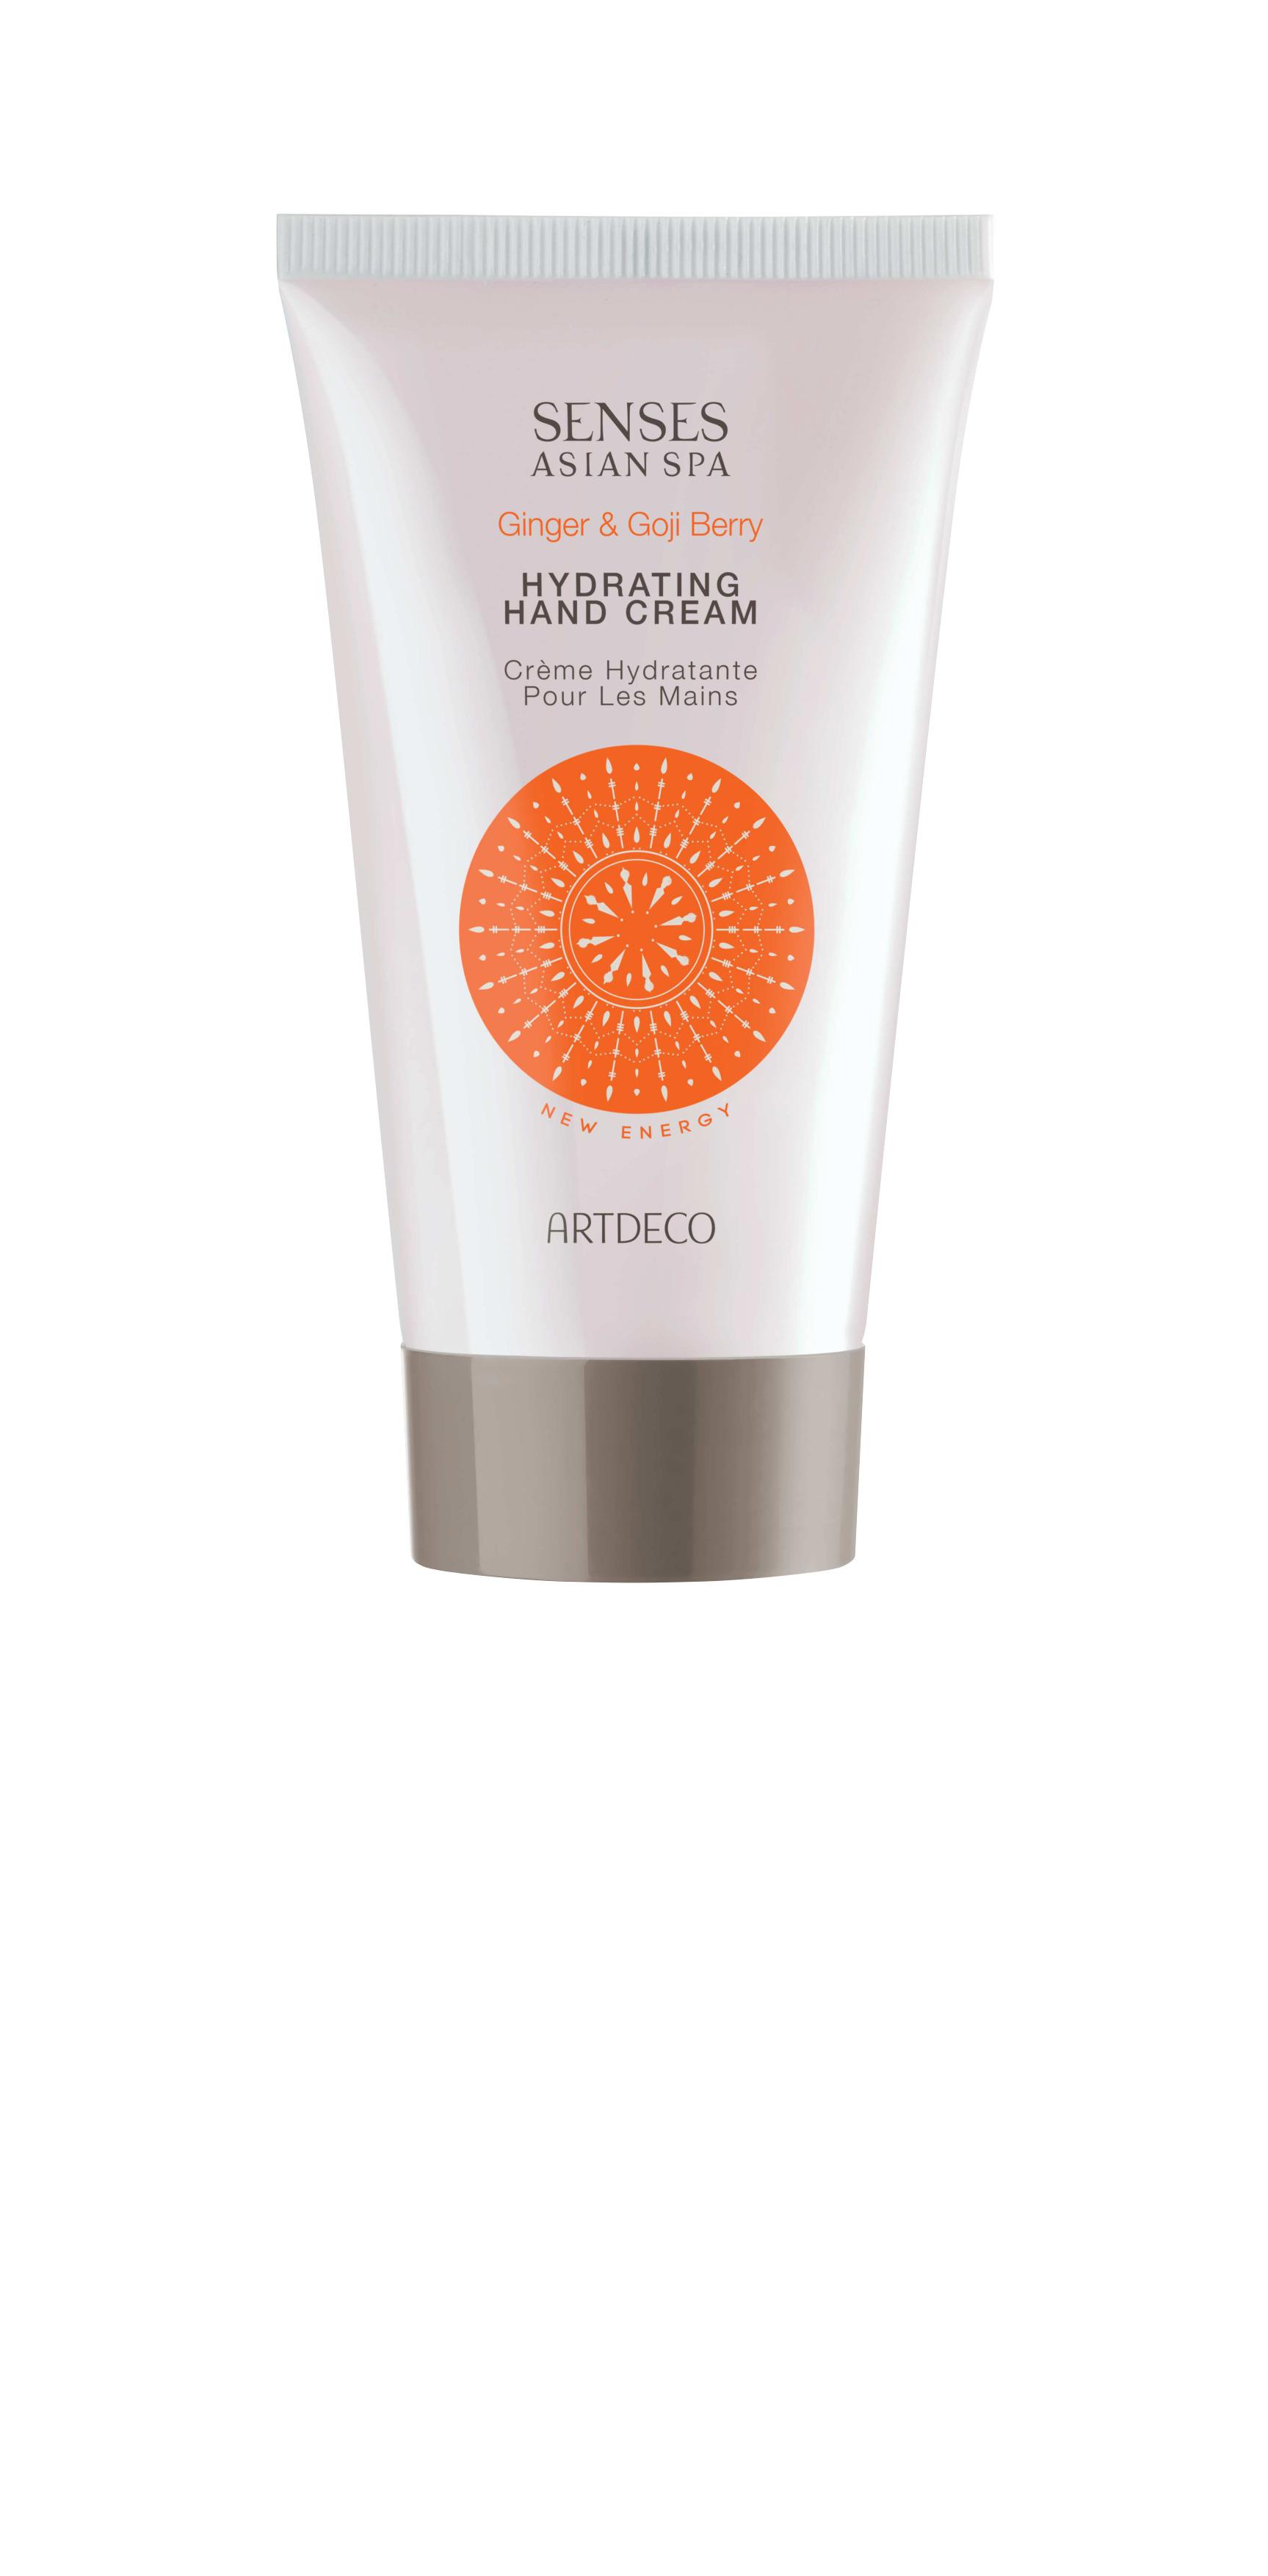 Artdeco крем для рук увлажняющий Hydrating hand cream, new energy, 75 мл the yeon hallabong energy moisture hand cream крем для рук мандариновый увлажняющий 50 мл